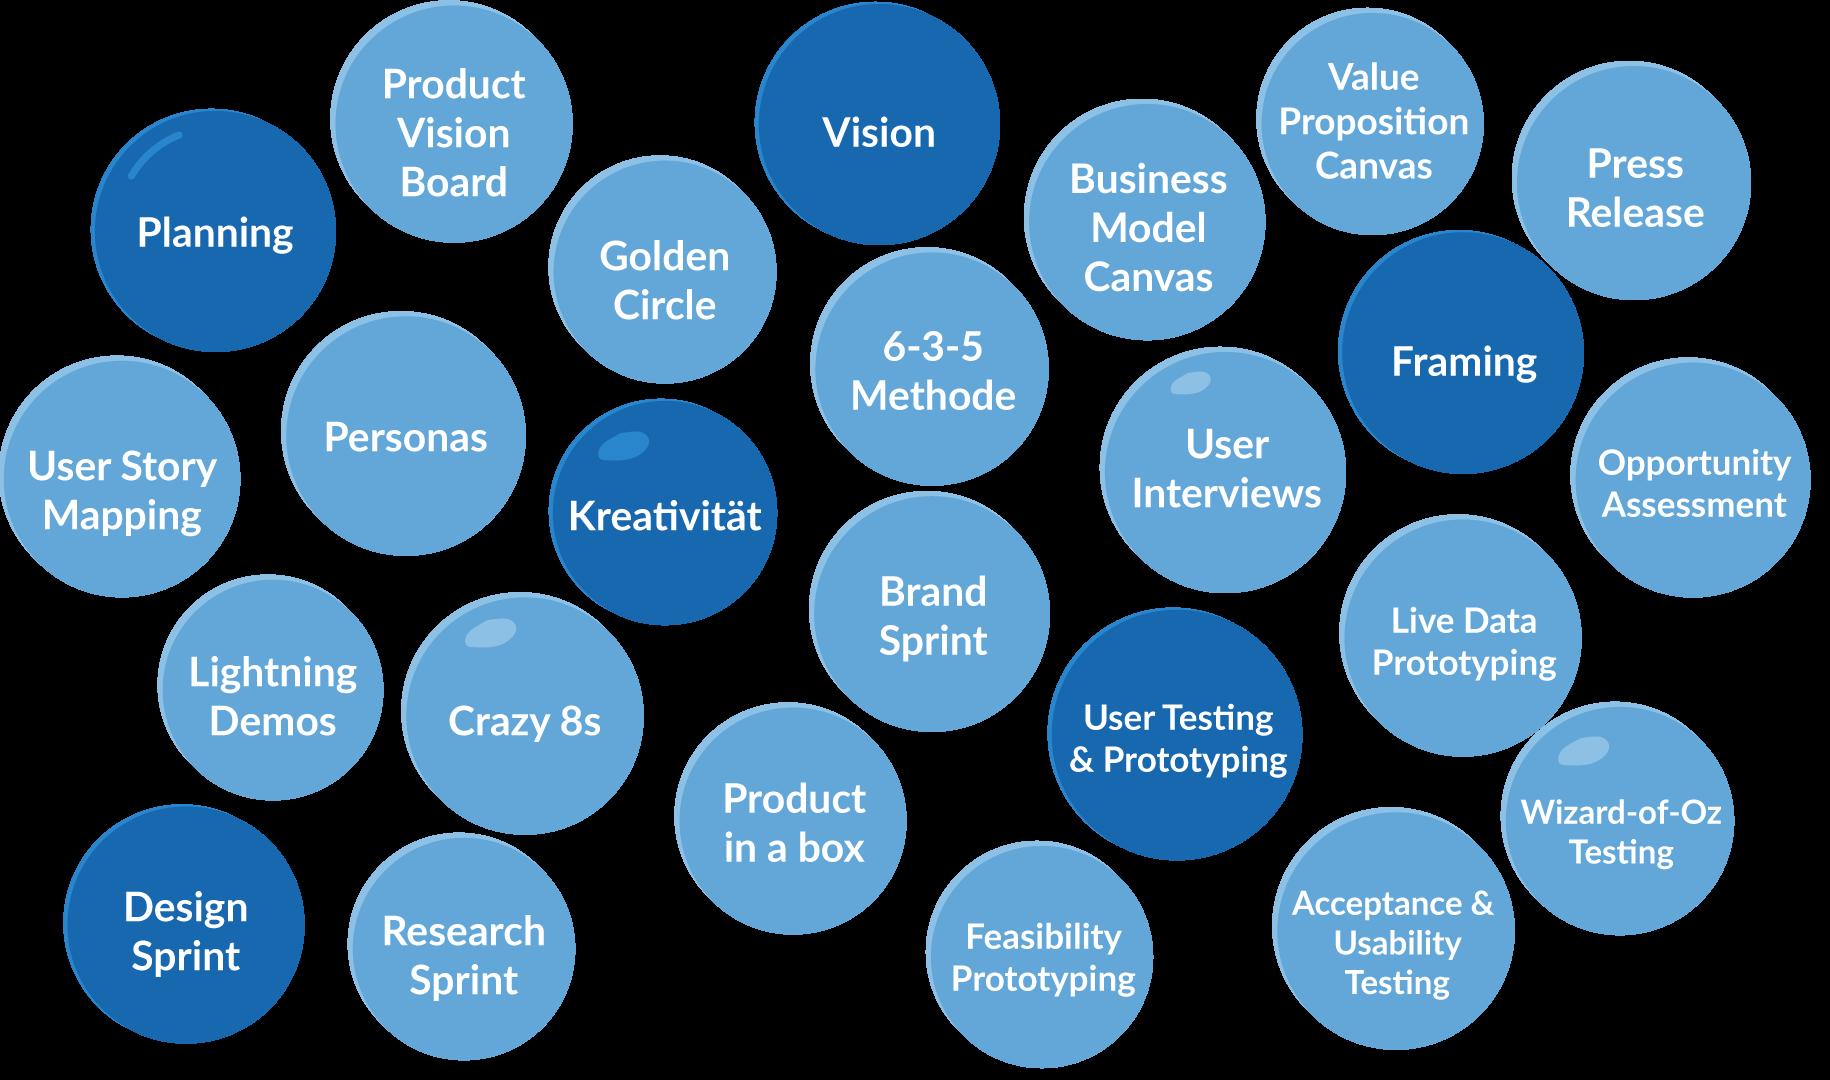 Verschiedene Aspekte der Product Discovery in Bubbles.